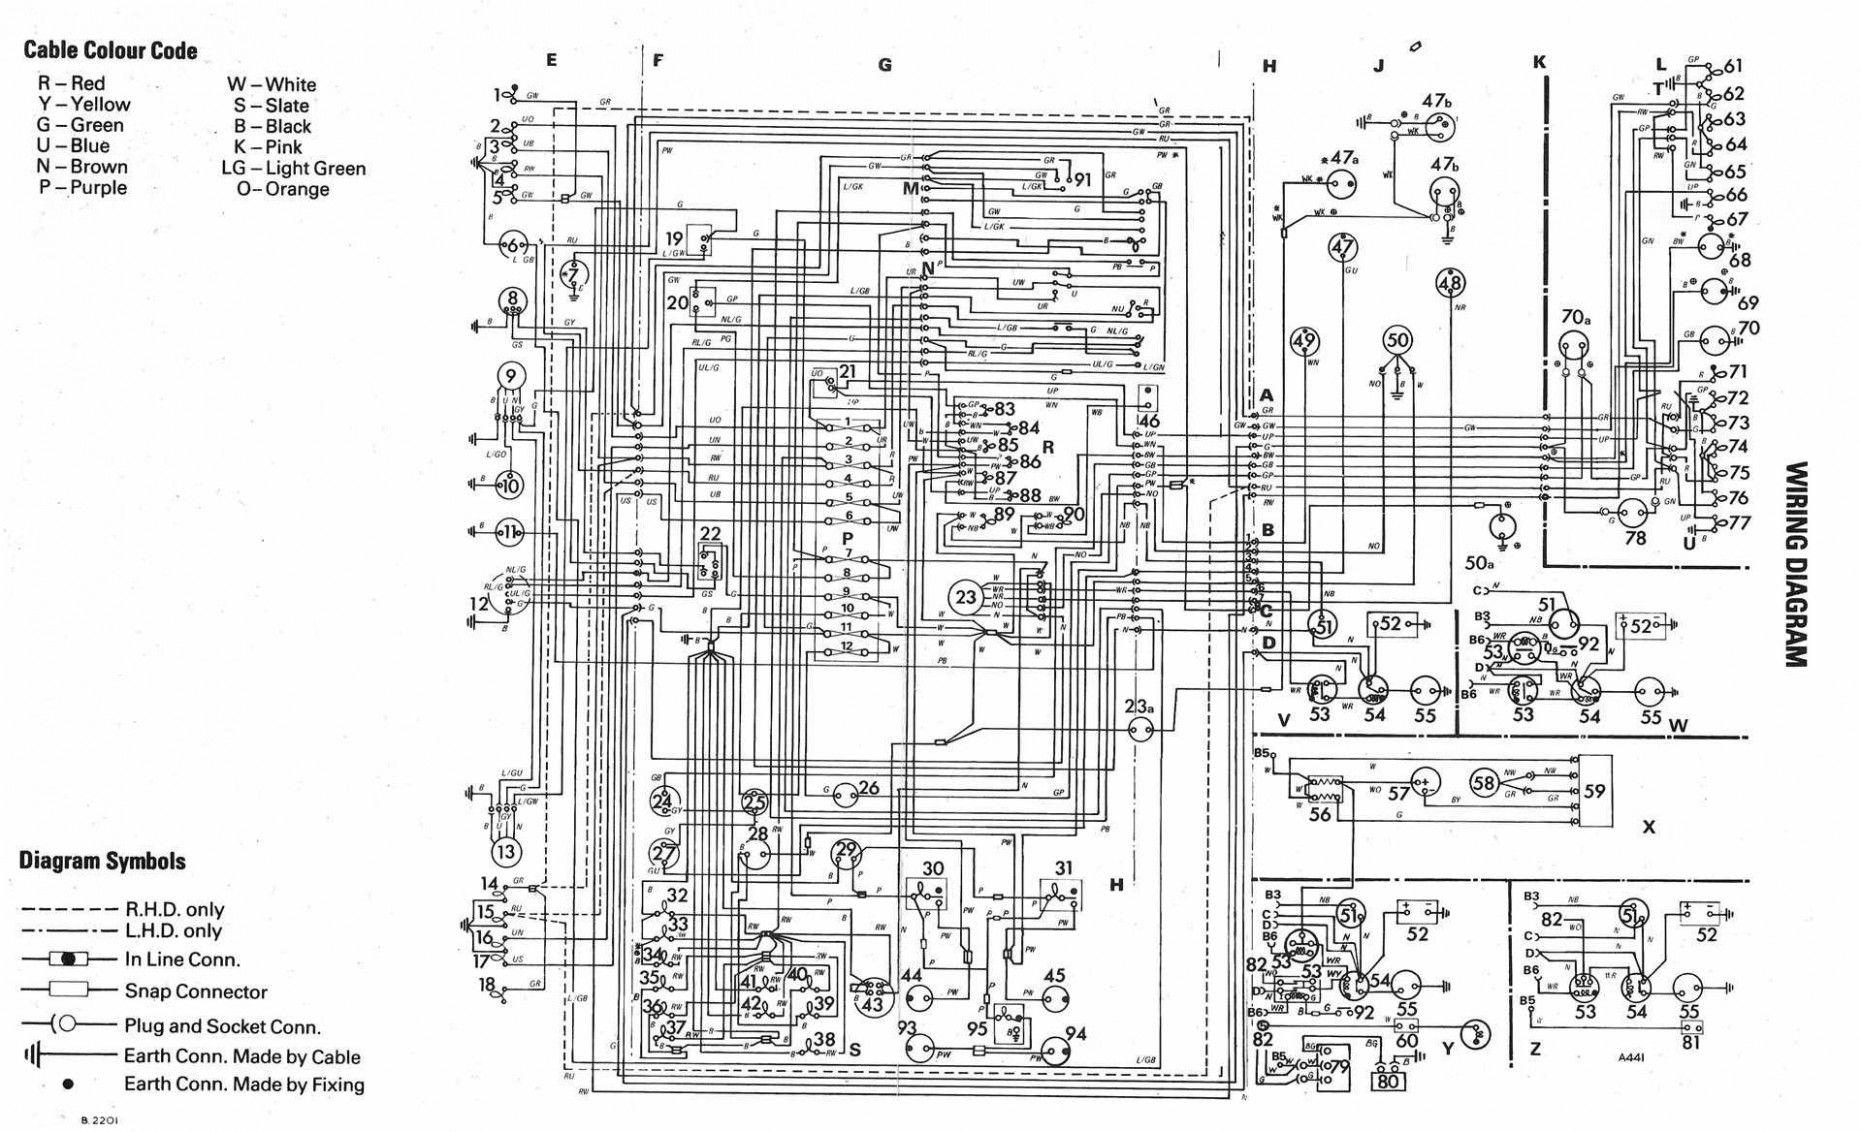 Vw Up Engine Diagram Pdf | Vw up, Volkswagen golf mk1, Vw golf | Gti Engine Diagram S |  | Pinterest